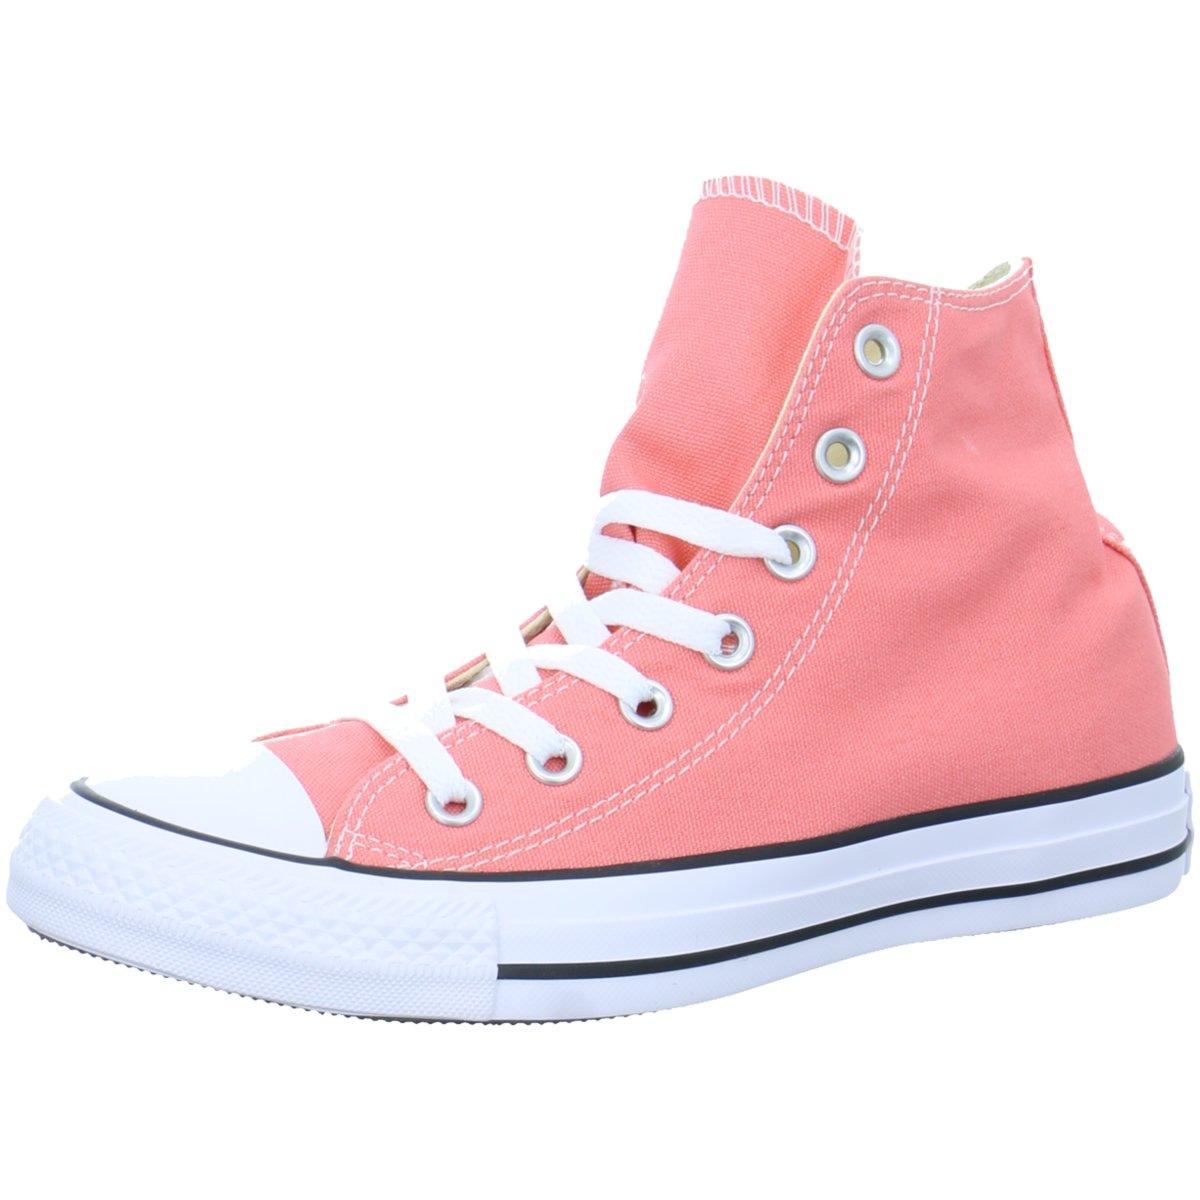 NEU Converse Damen Sneaker Sneaker High CT BS HI 157611C rot 357036